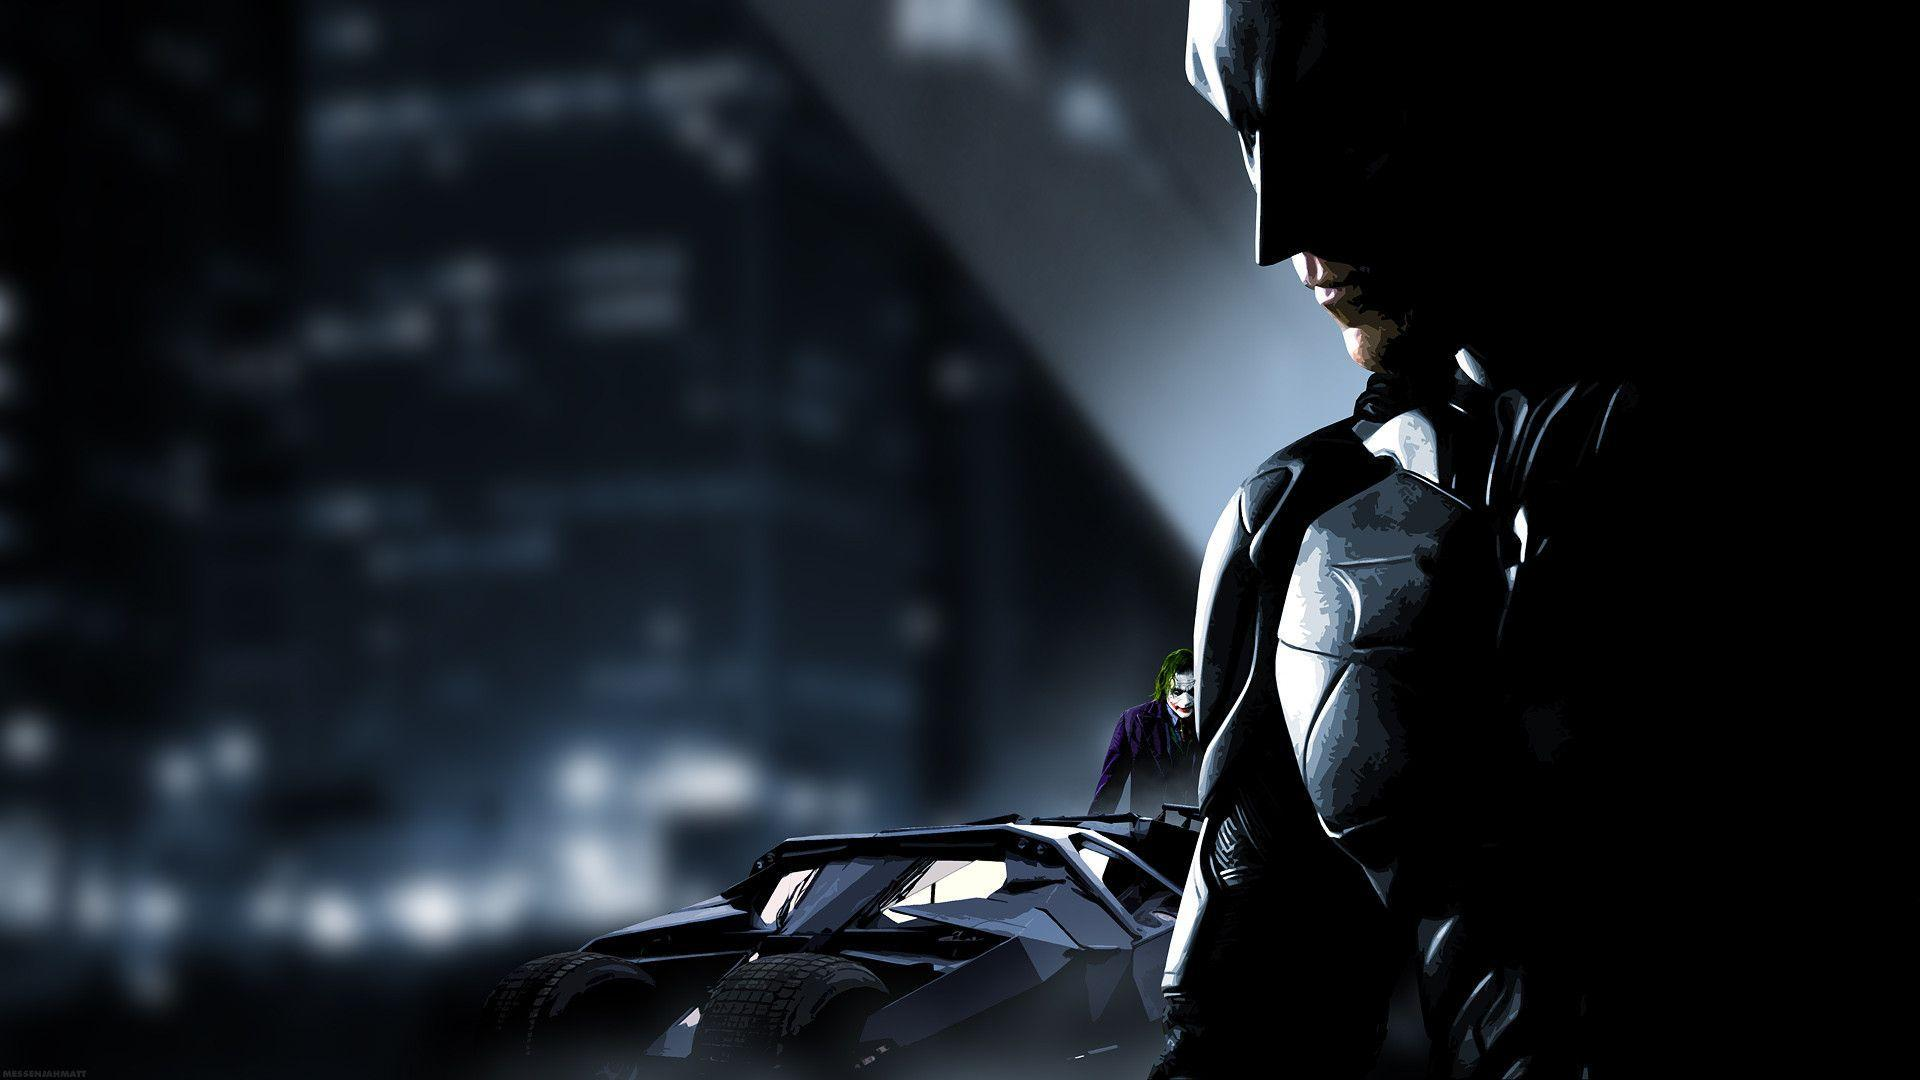 Wallpapers For > Batman Movie Hd Wallpaper